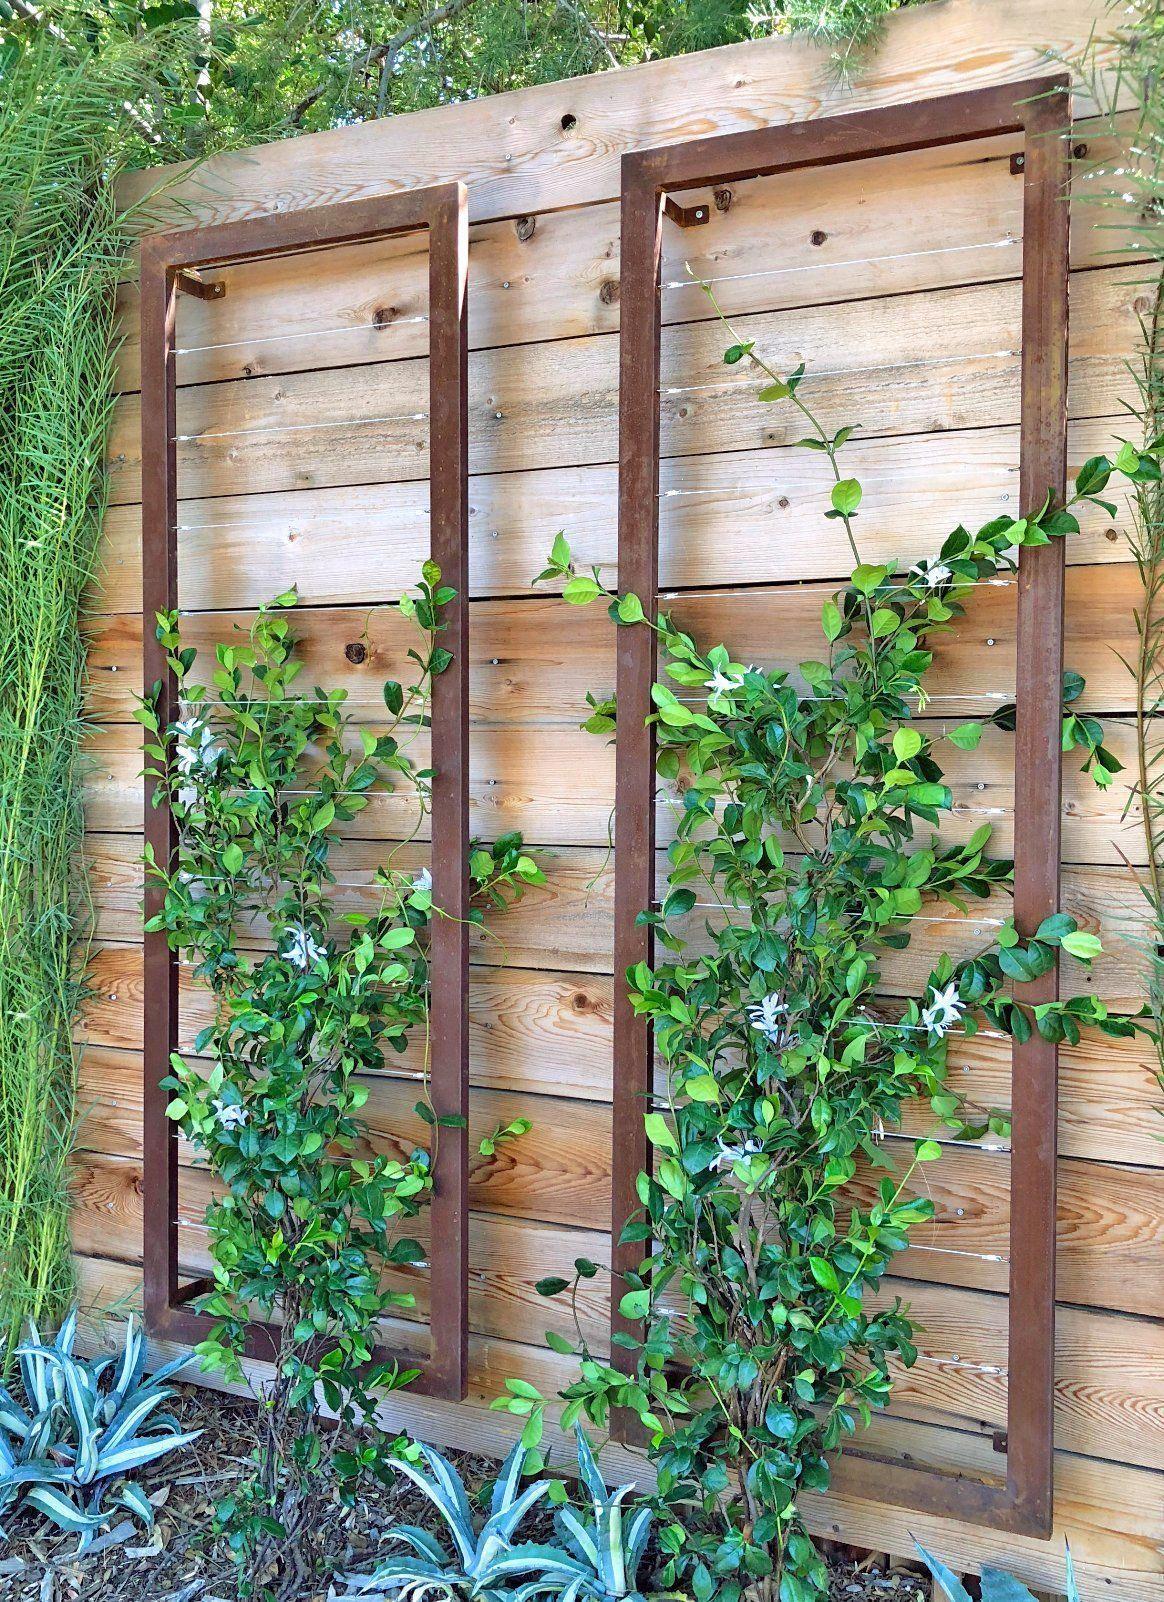 Ina Wall Trellis Sr Backyardgarden Modern Garden Trellis Wall